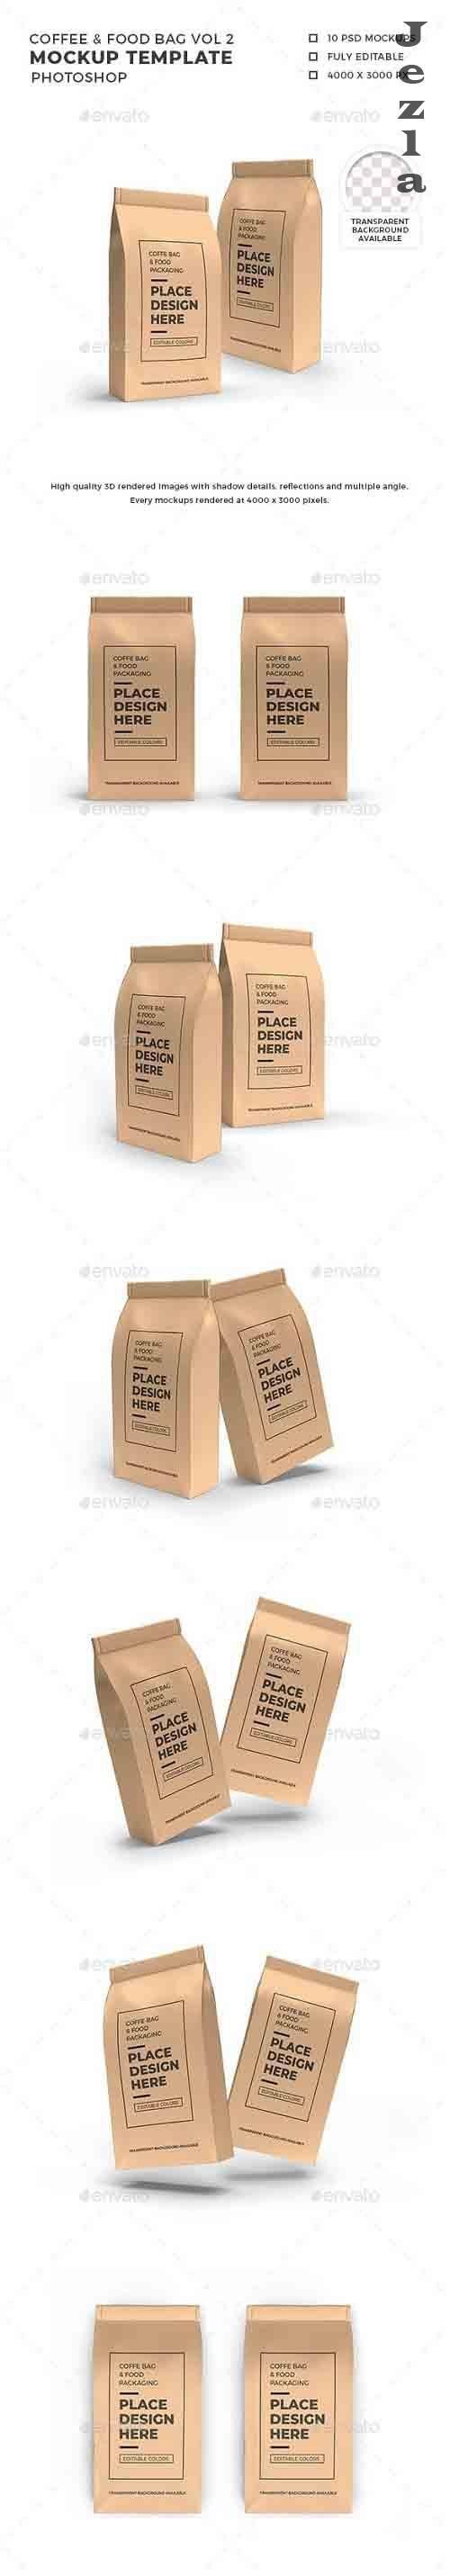 Food Paper Bag Packaging Mockup Template Vol 2 - 32513021